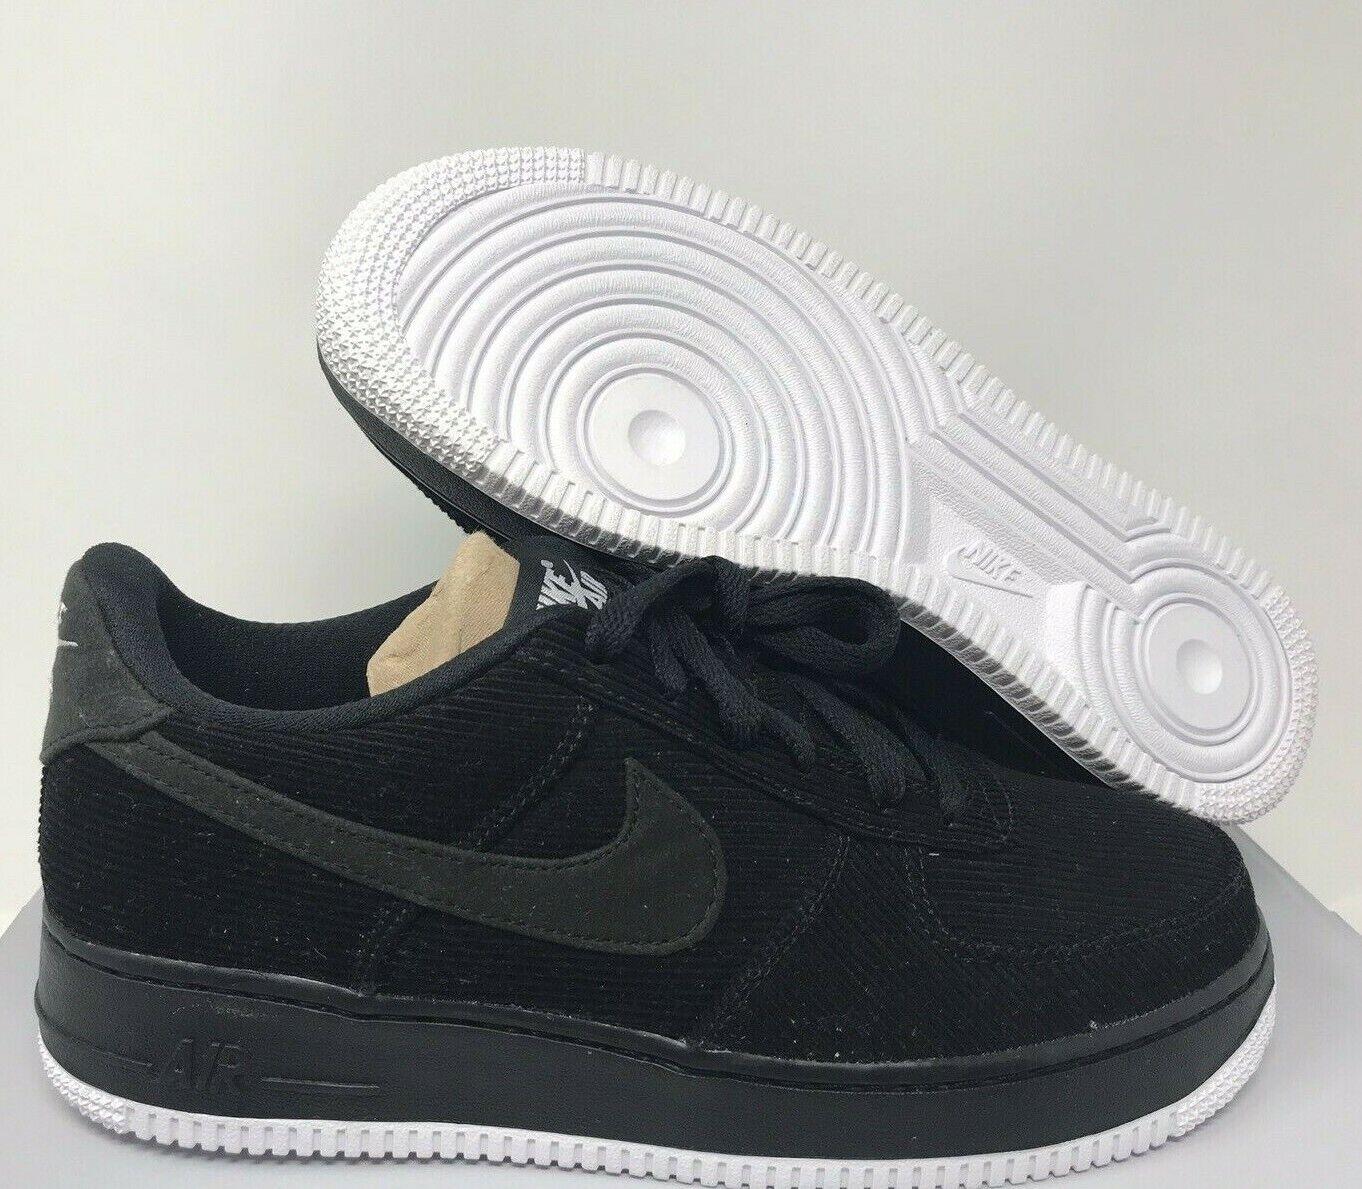 Uganda equilibrar visa  Ropa, zapatos, accesorios de hombre Nike Air Force 1 lv8 2 GS Black Wolf  Grey talla 36 36,5 37 37,5 negros bq5484 001 Ropa, calzado y complementos  aniversarioqroo.cozumel.gob.mx